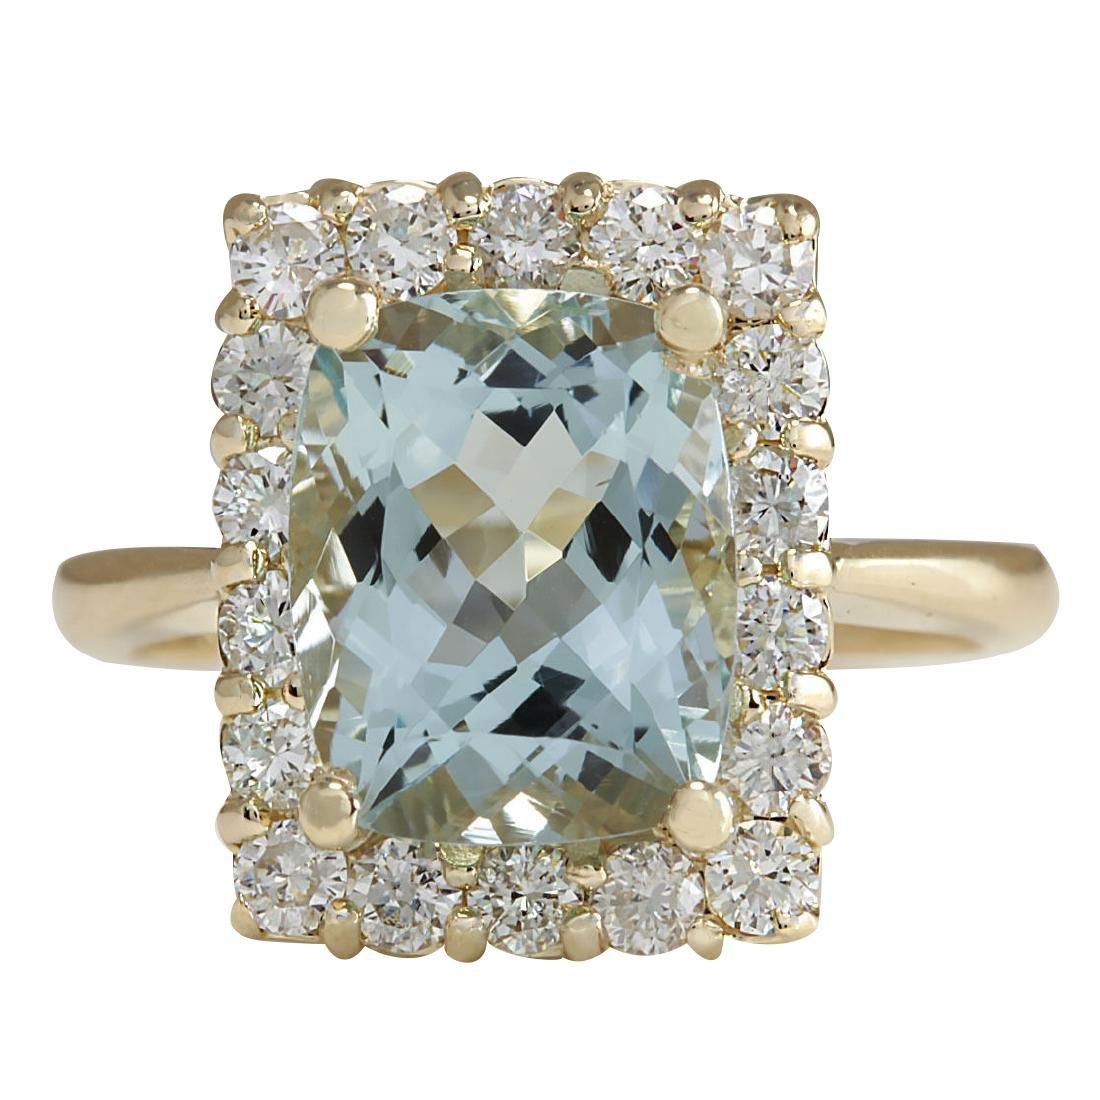 4.54CTW Natural Aquamarine And Diamond Ring In 18K